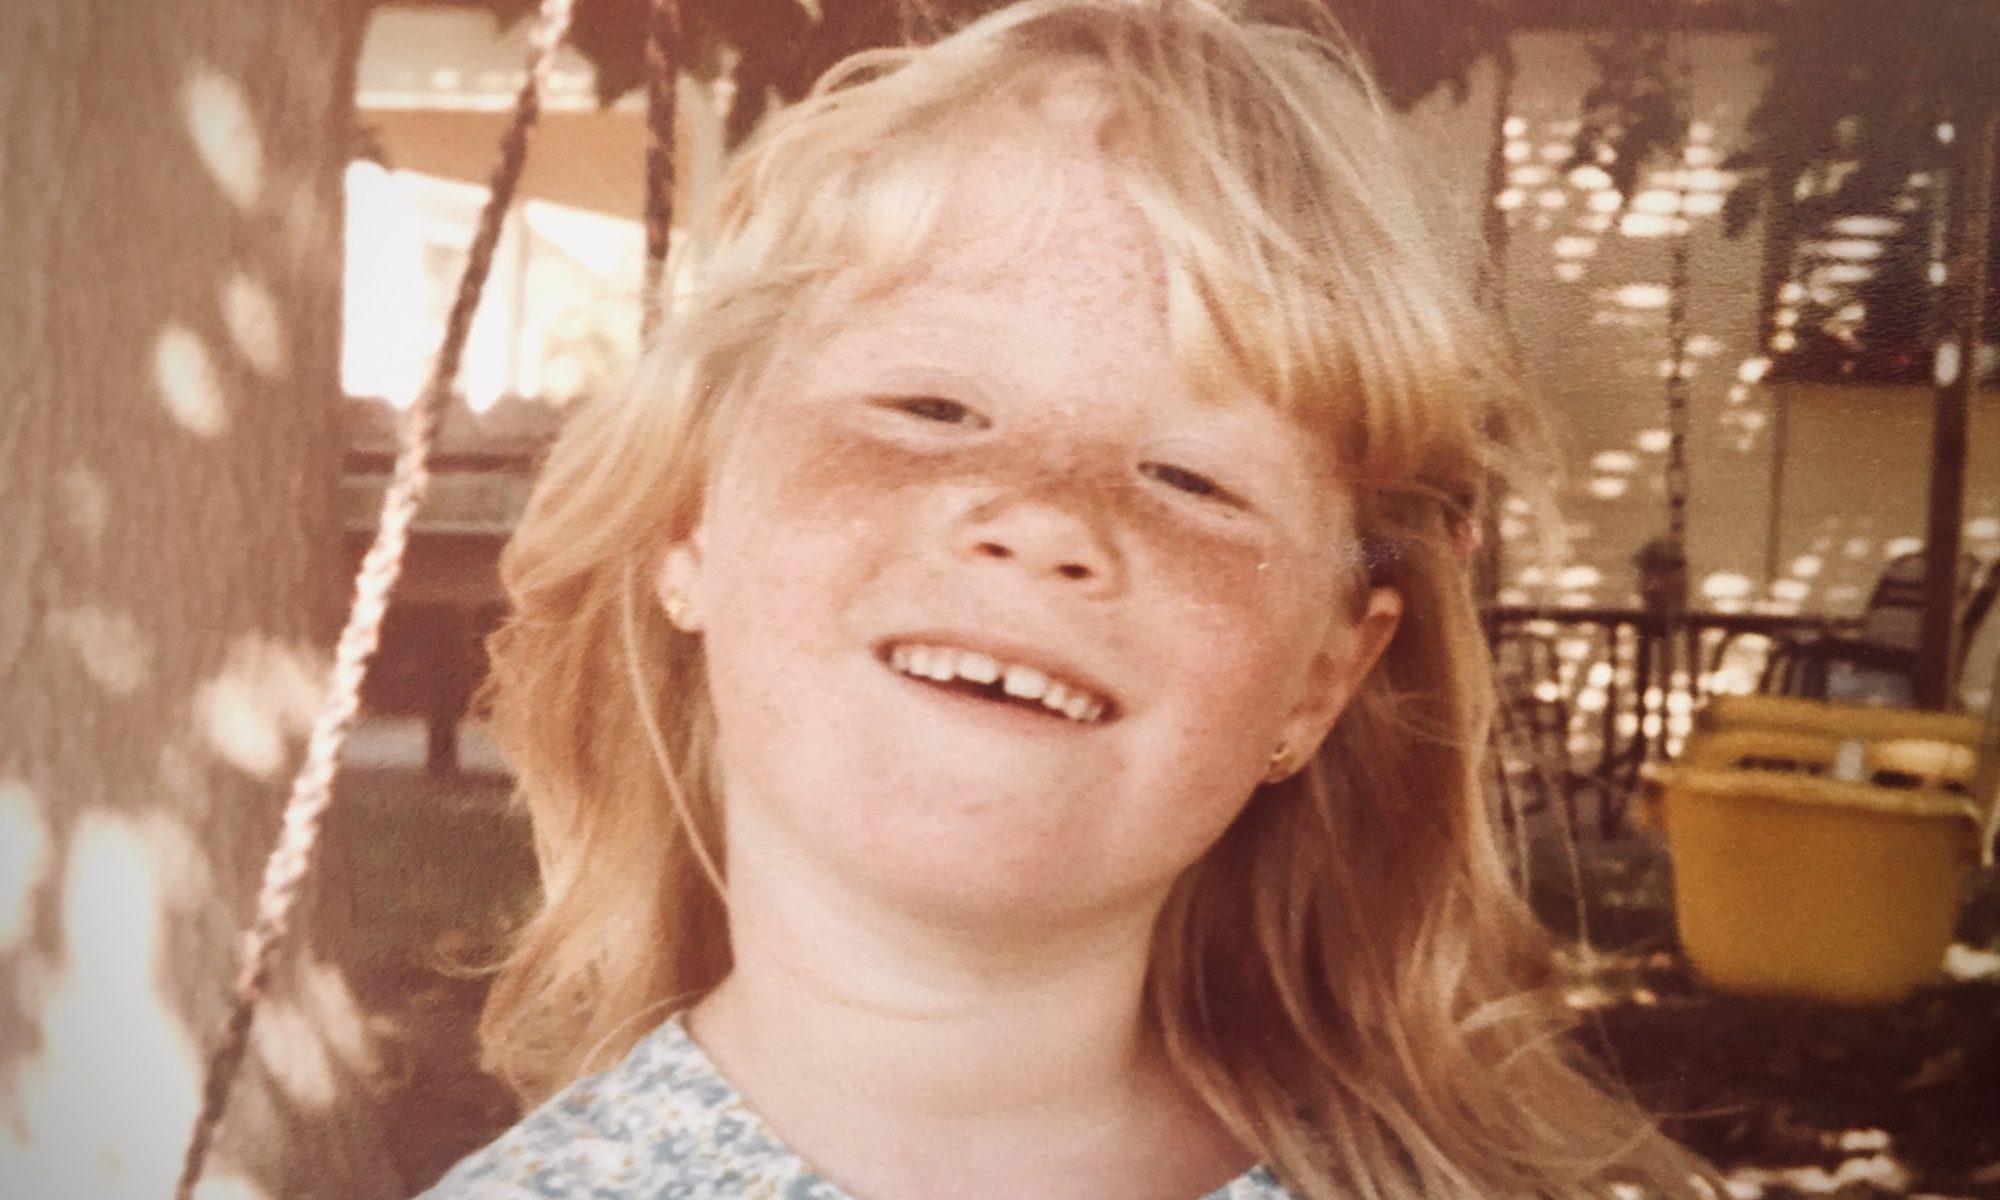 Anna in 1981, age 6, in her backyard.